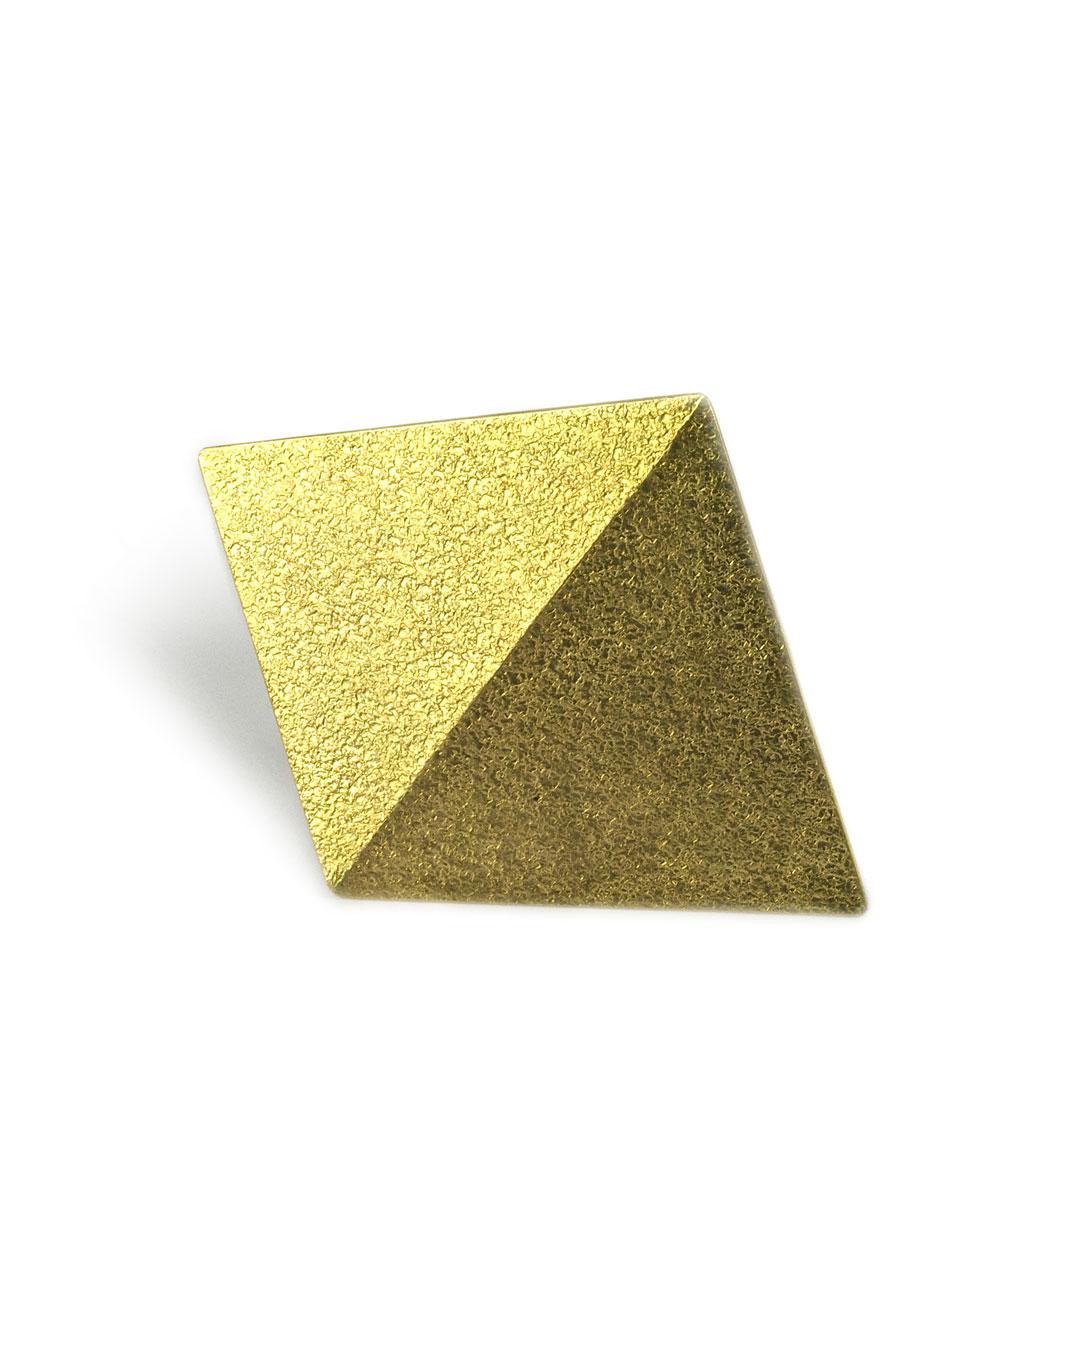 Okinari Kurokawa, untitled, 2007, brooch; 20ct gold, stainless steel, 45 x 56 x 5 mm